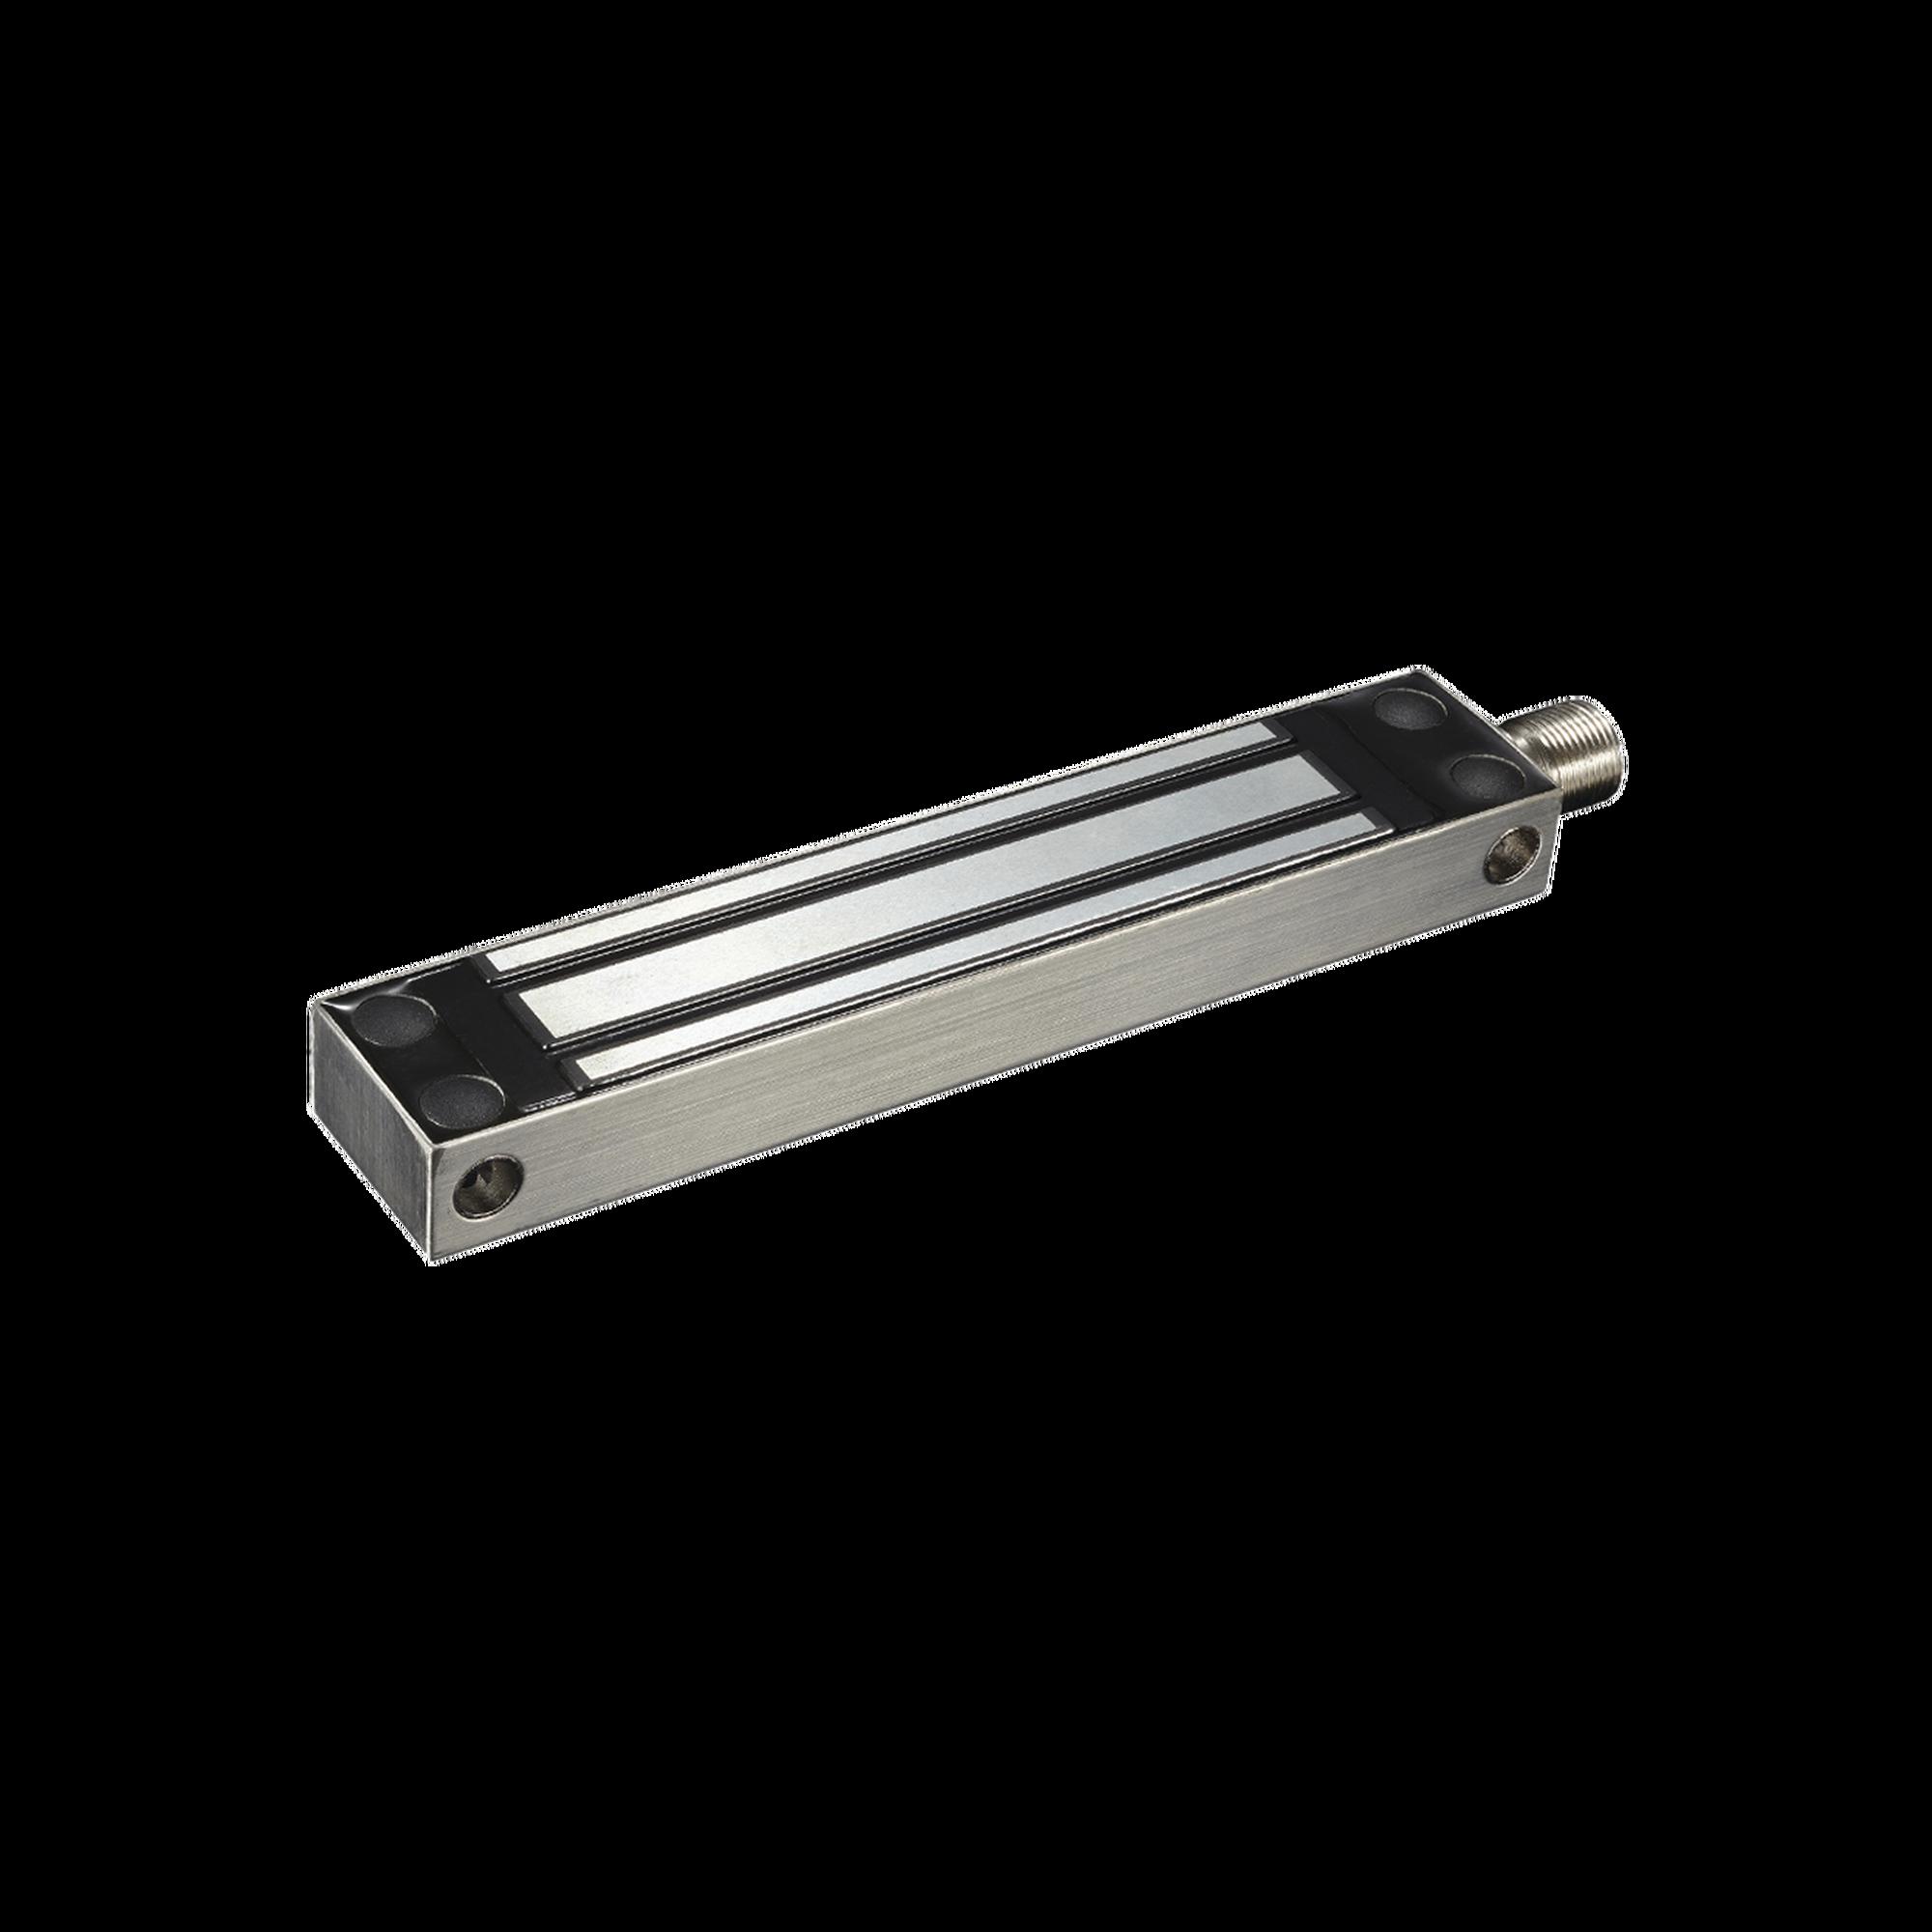 Chapa magnética 600 lbs para uso en Exterior / Cumple IP68